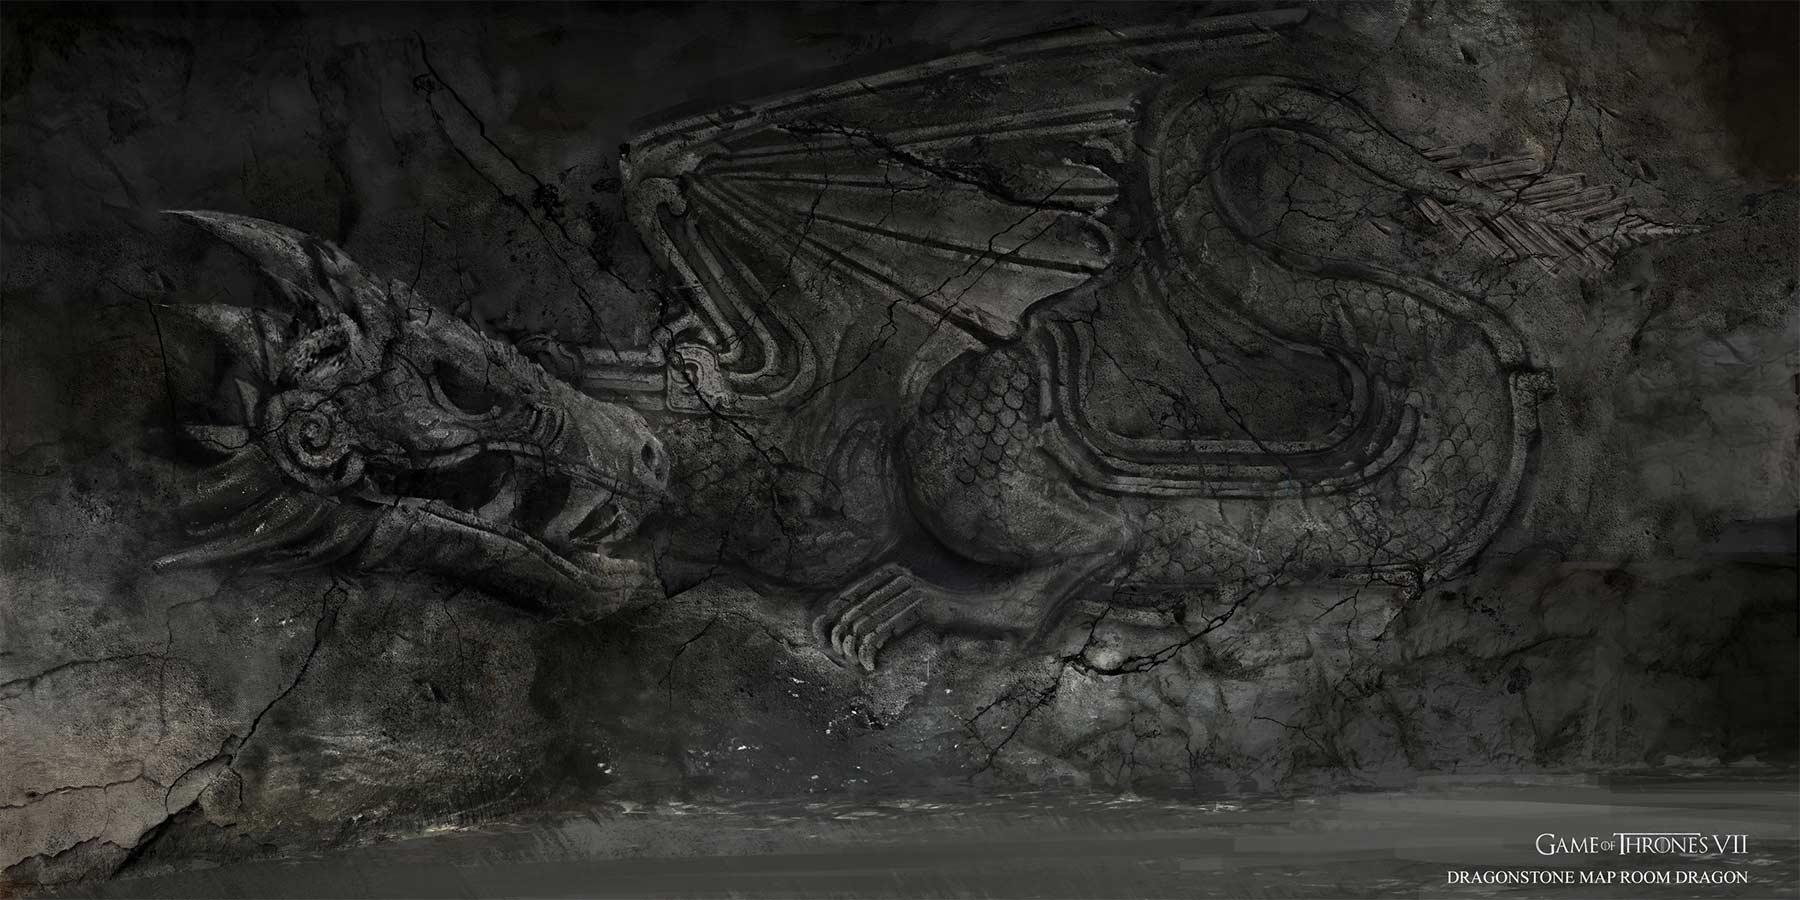 Game of Thrones Staffel 7 Concept Art Kieran-Belshaw-game-of-thrones-concept-art_07